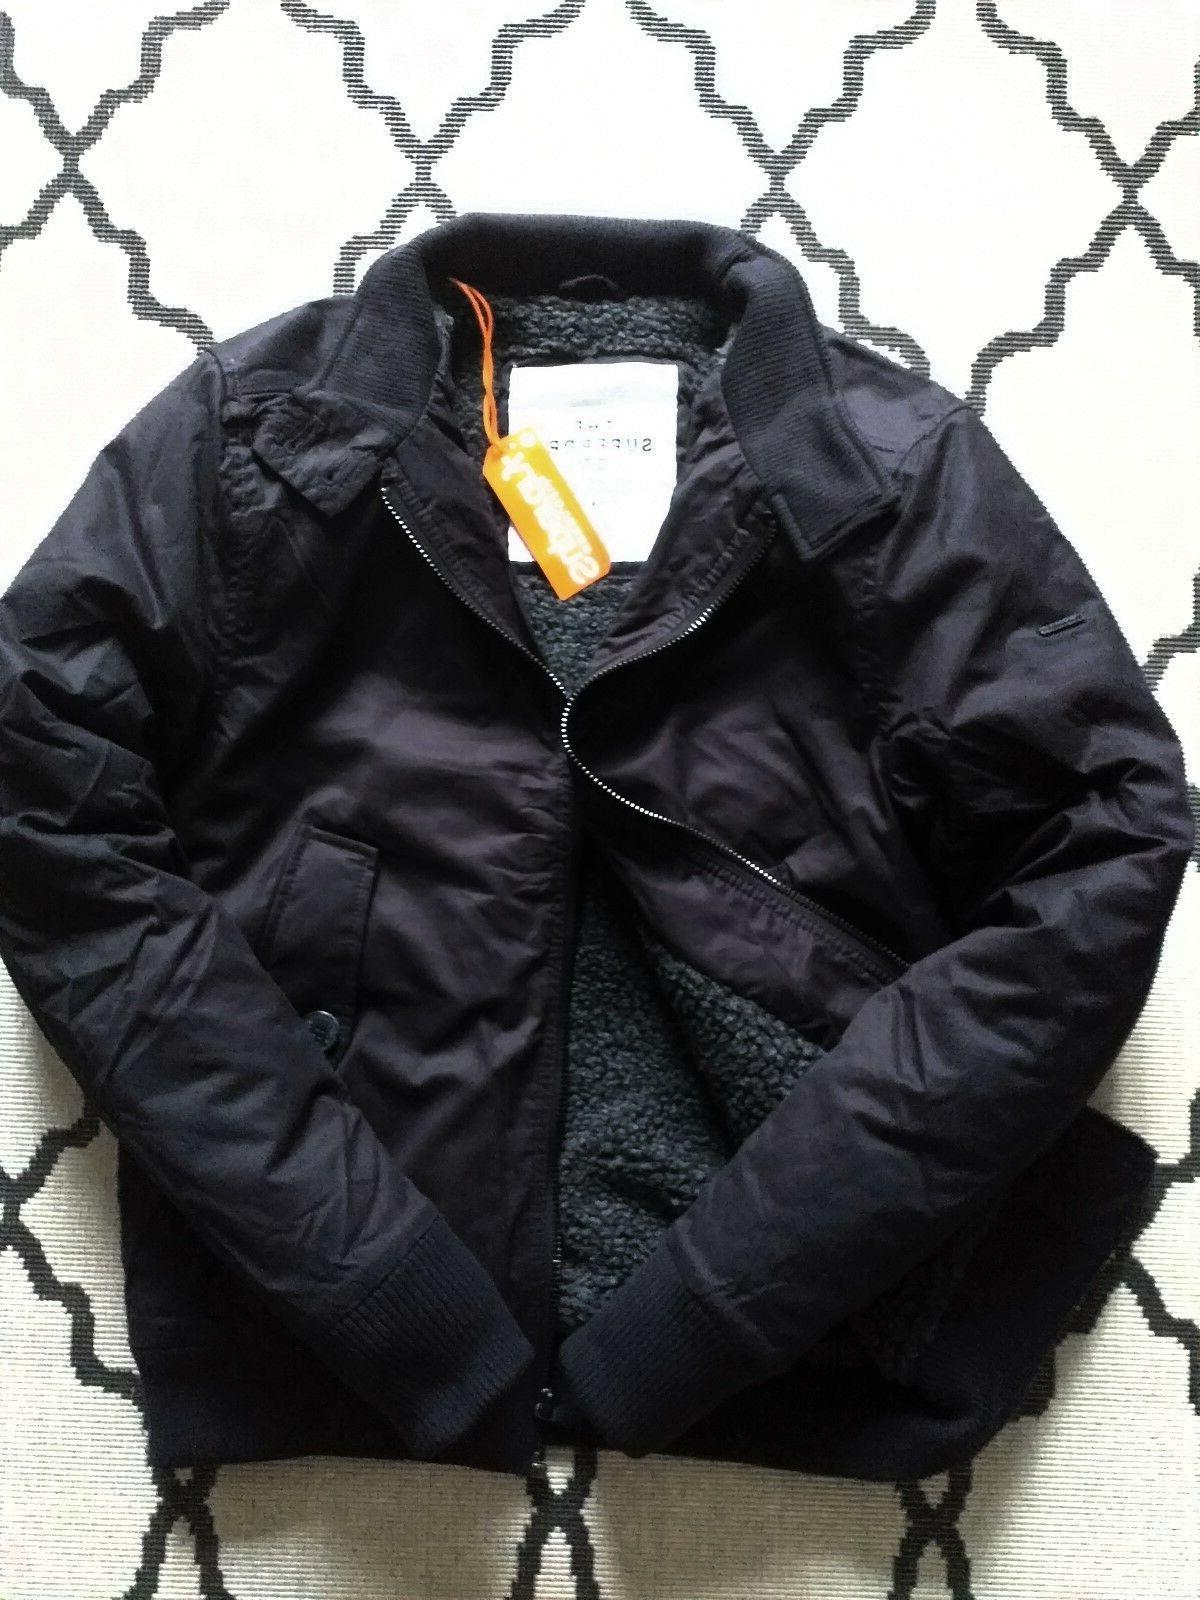 mens winter longhorn harrington jacket fleeced lined